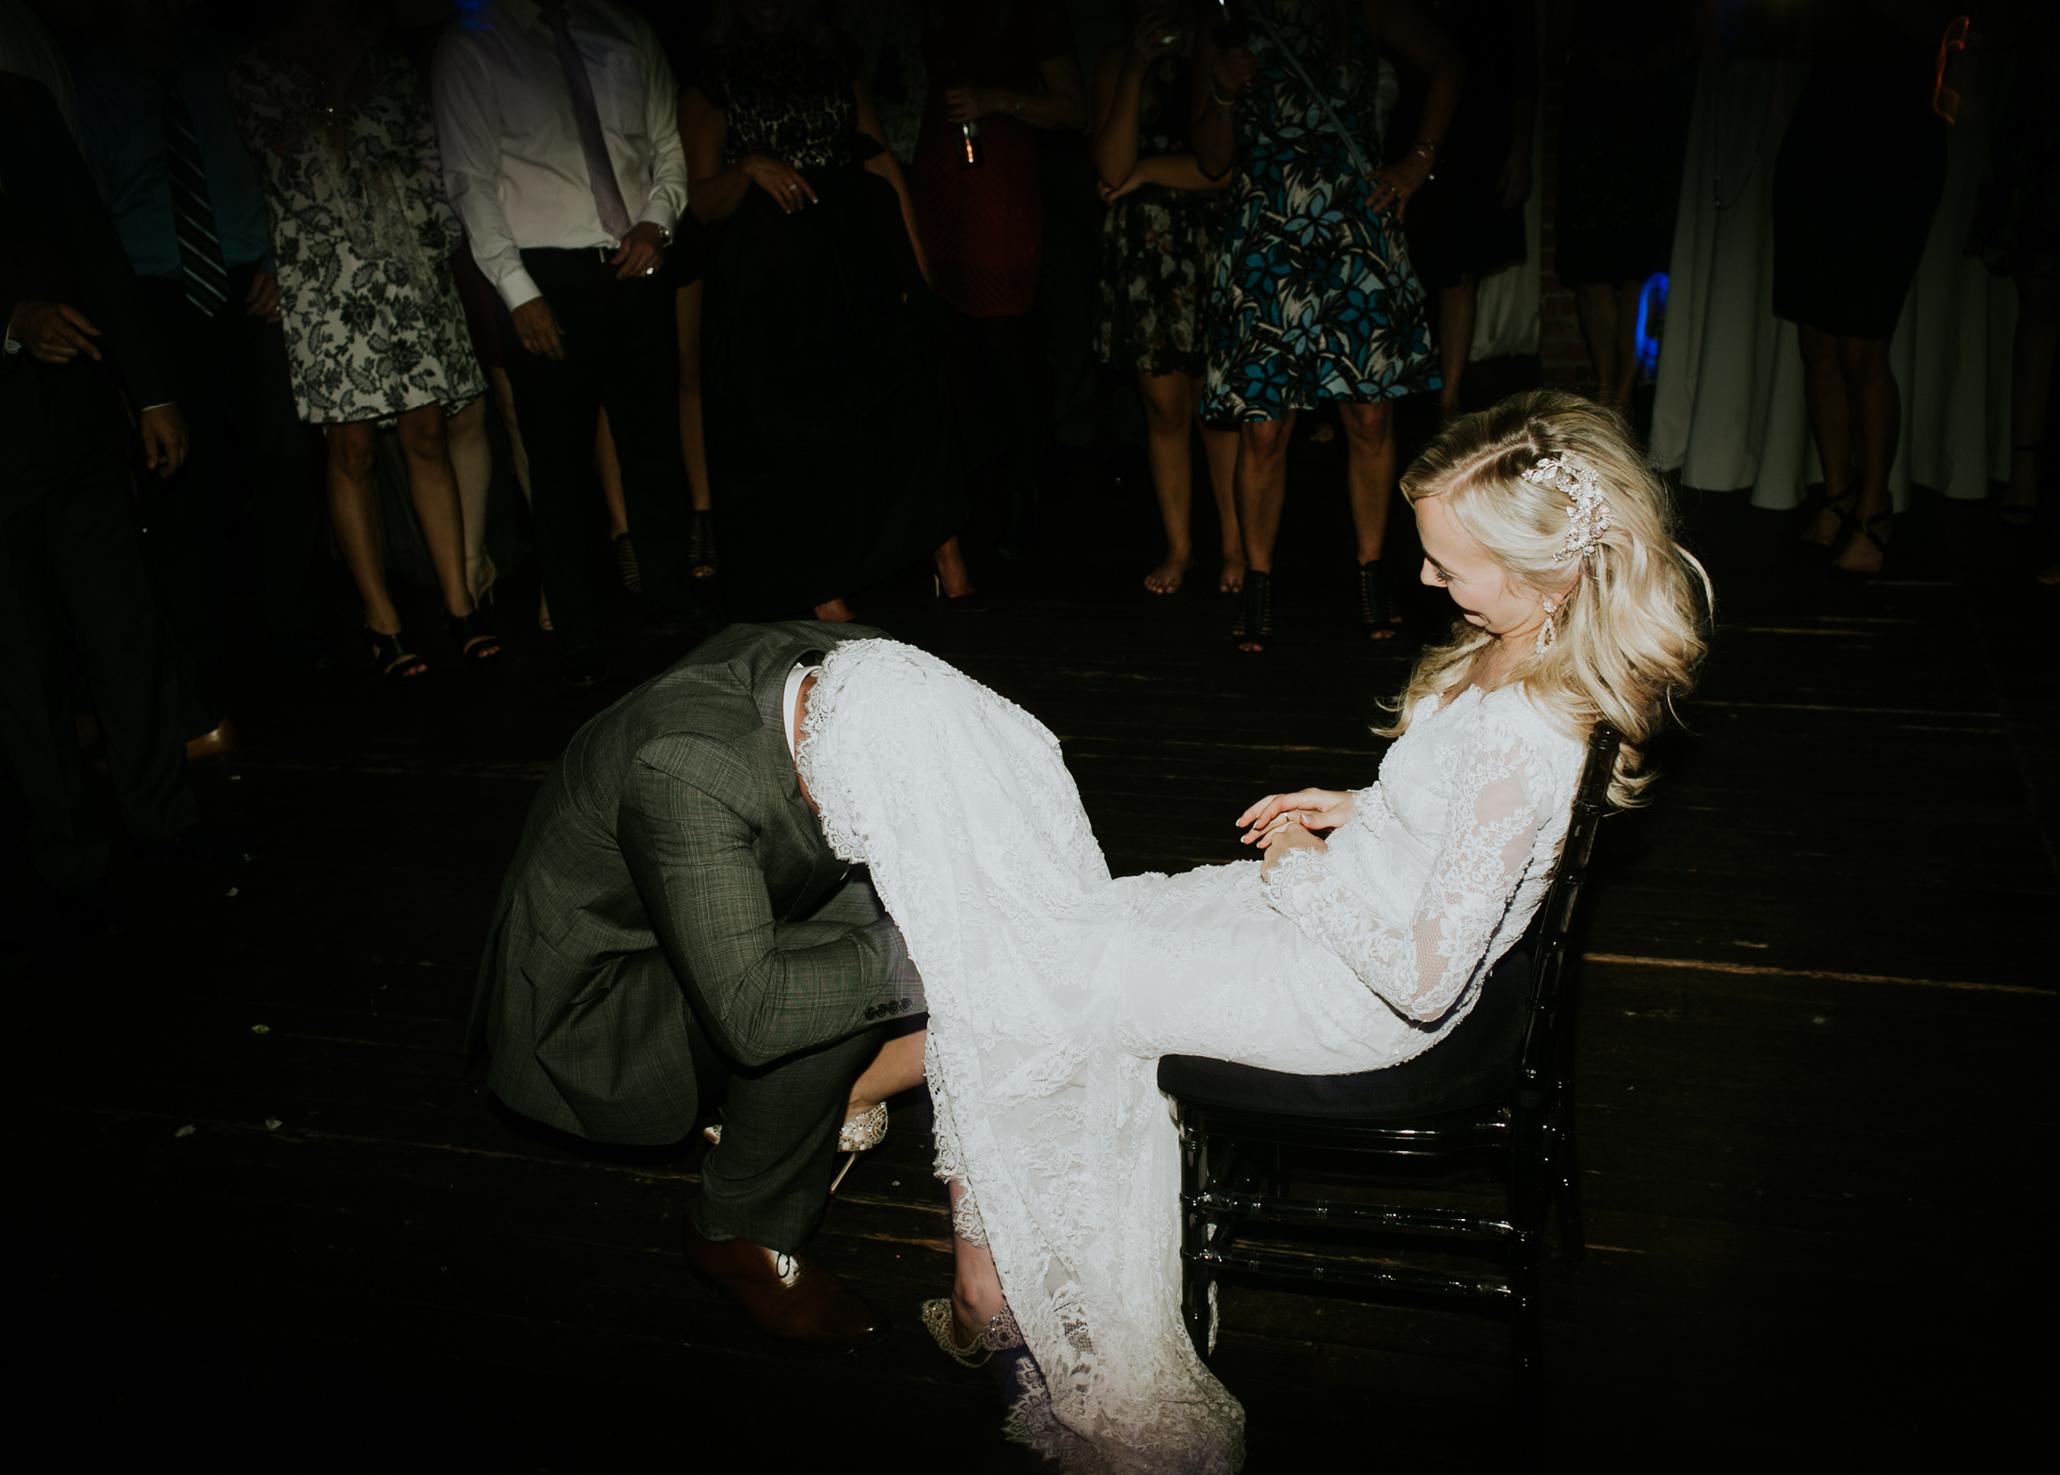 axis-seattle-wedding13